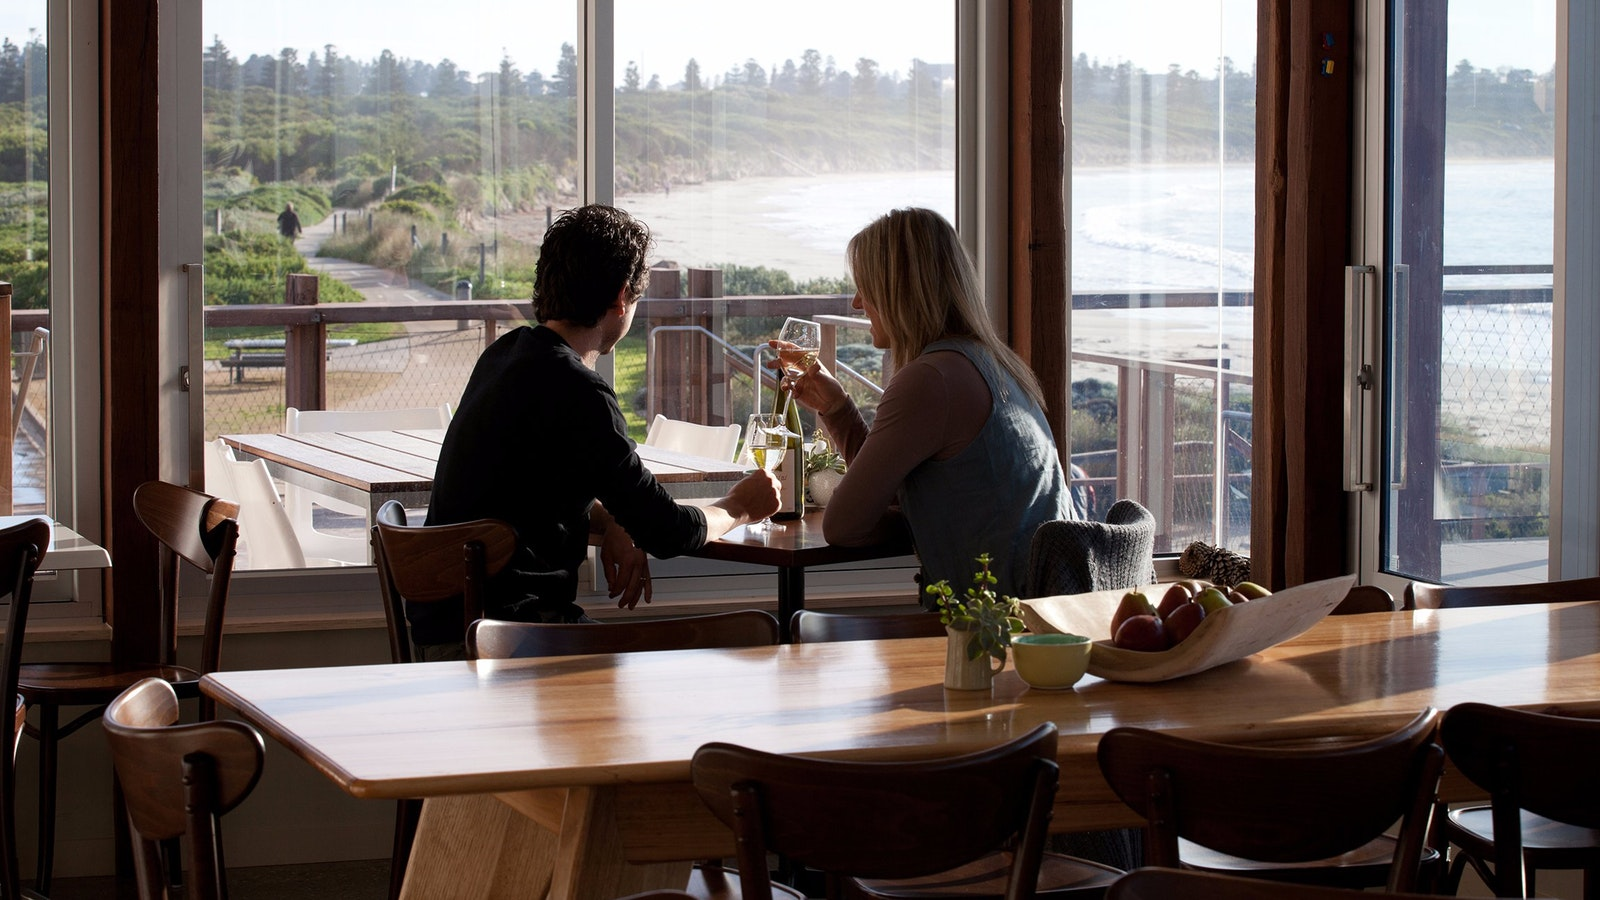 Pavilion Cafe & Bar - always a spectacular ocean view.